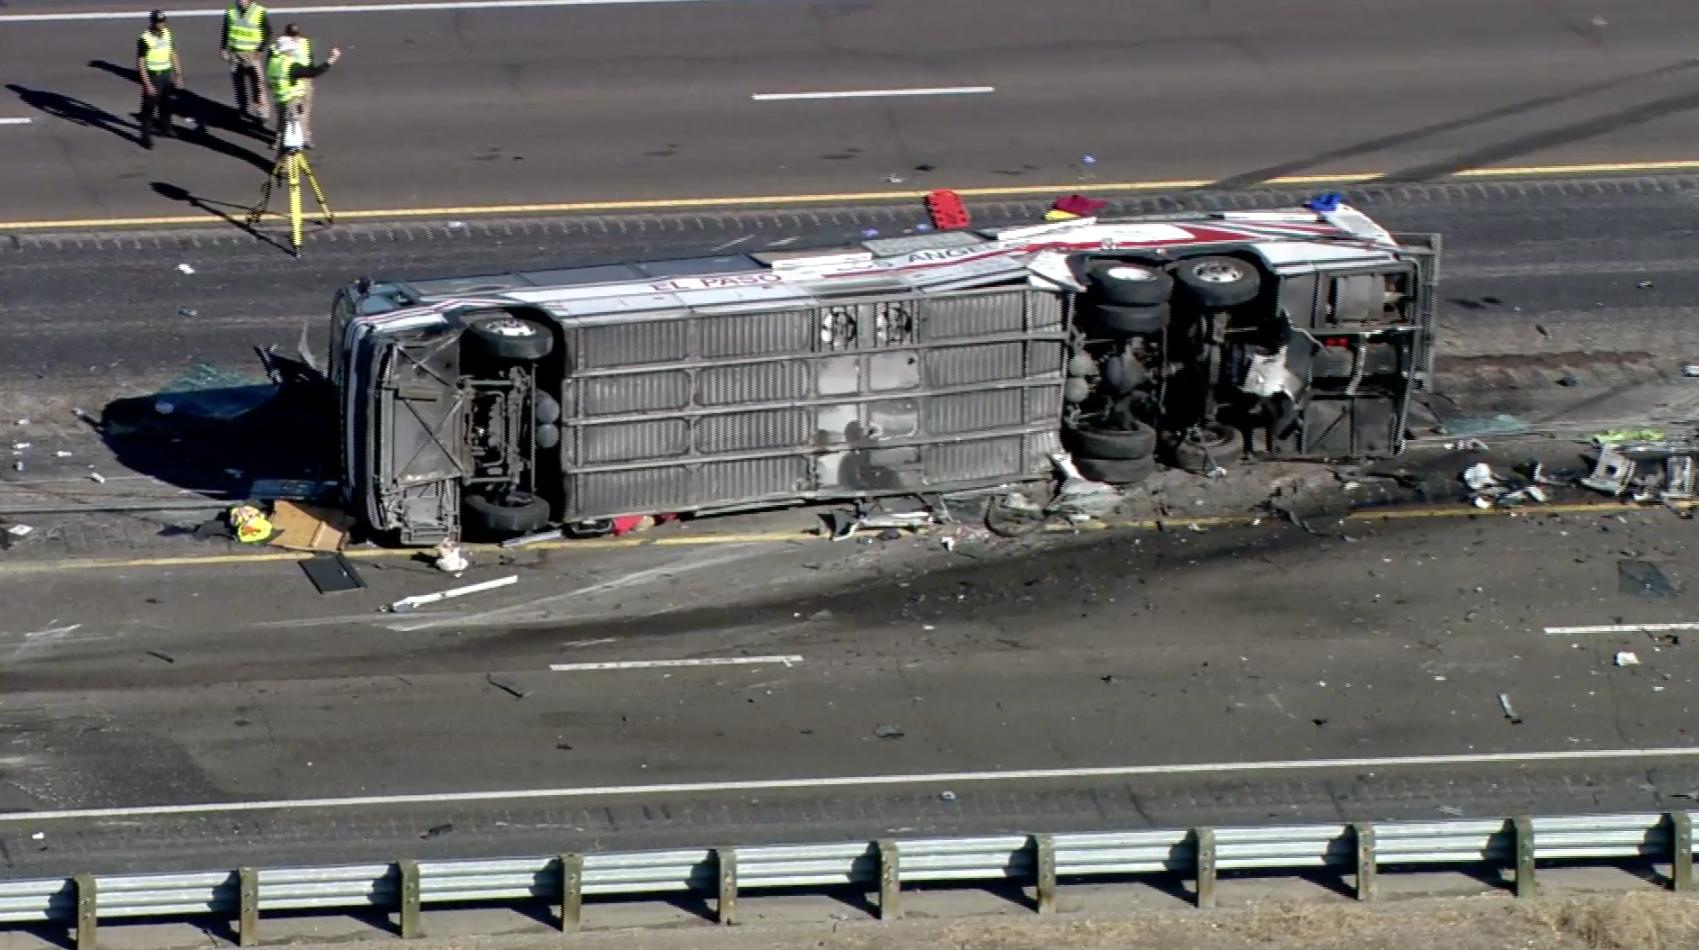 New Mexico bus crash: 3 dead, dozens hurt in highway multi-vehicle